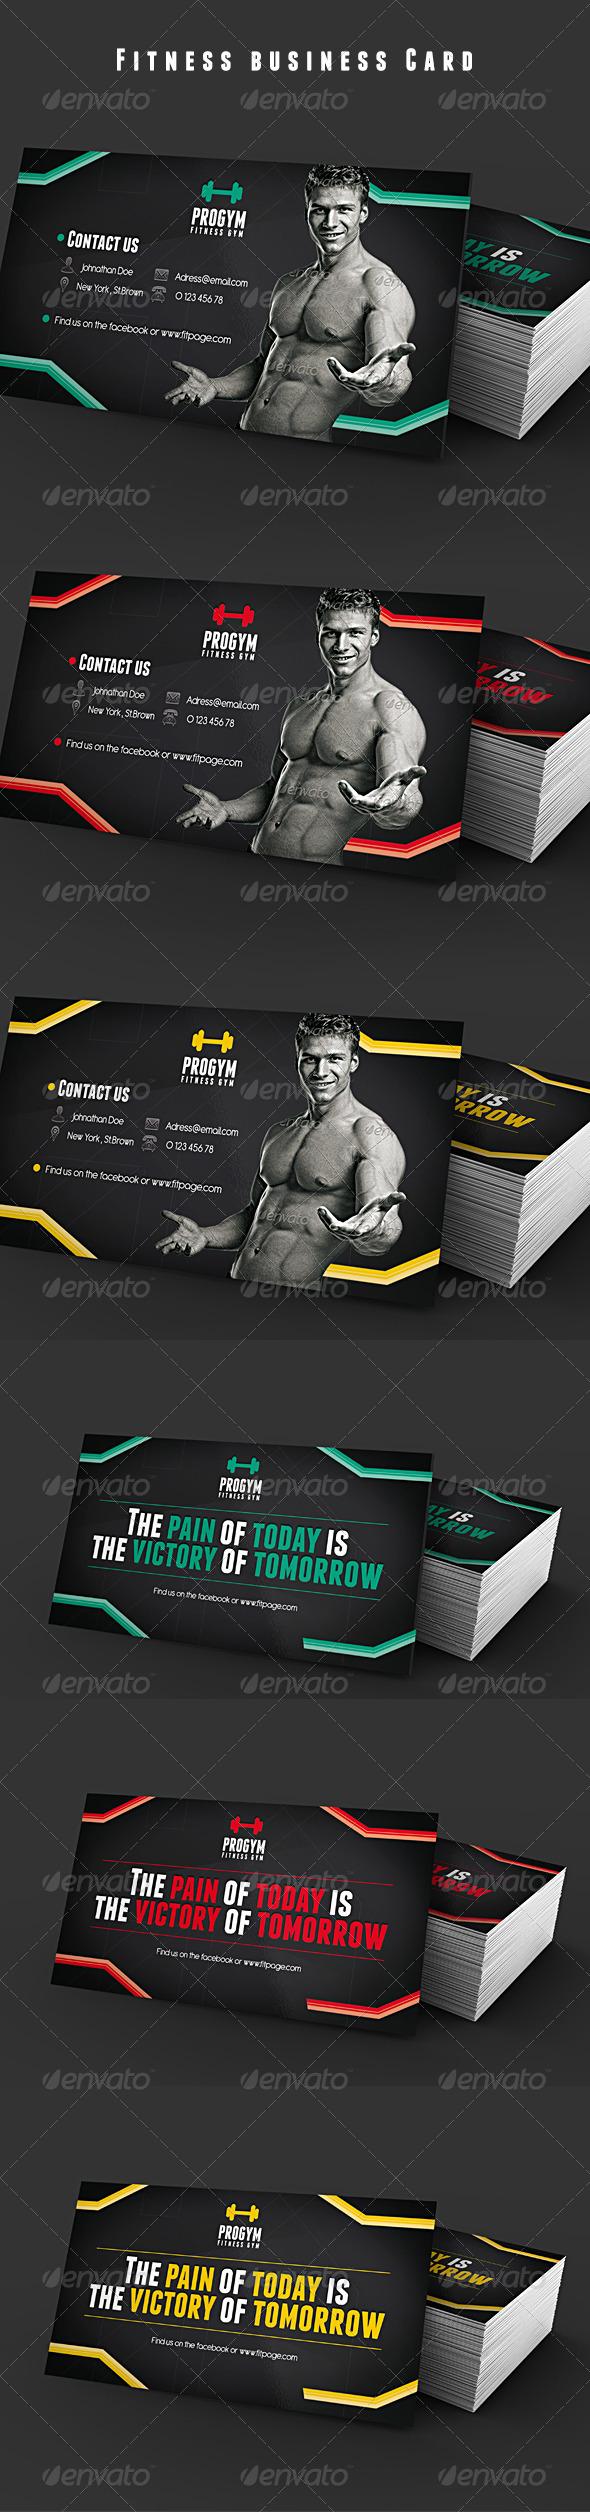 GraphicRiver Fitness Gym Business Card 5122145